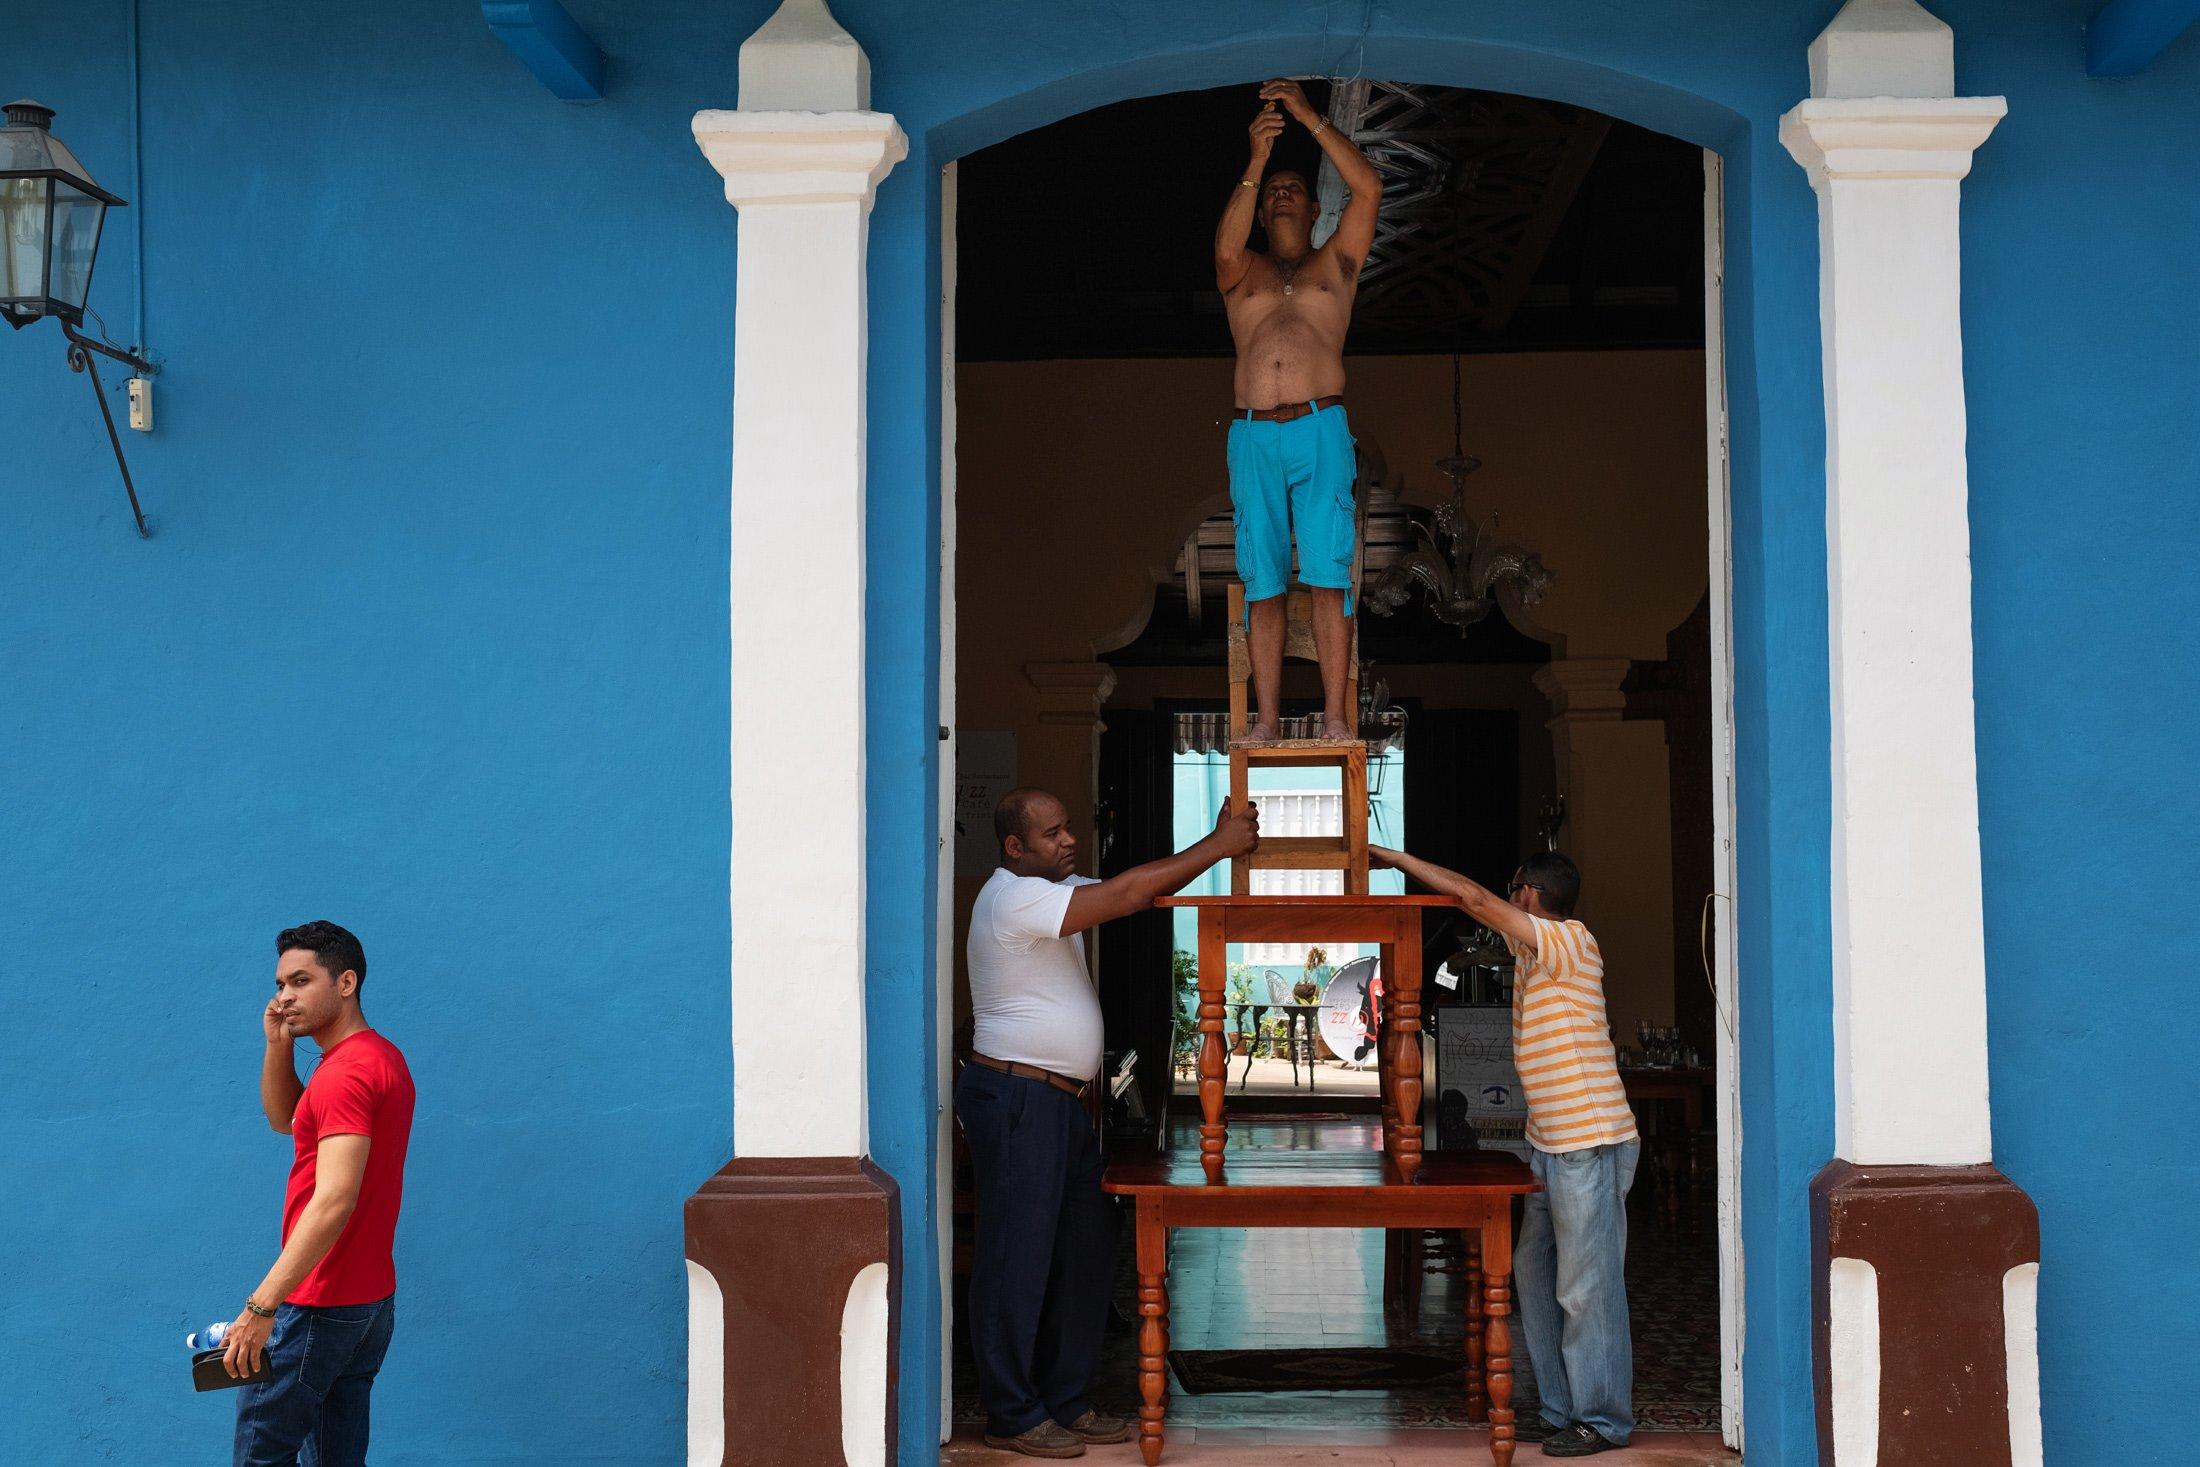 men standing on a chair in Cuba